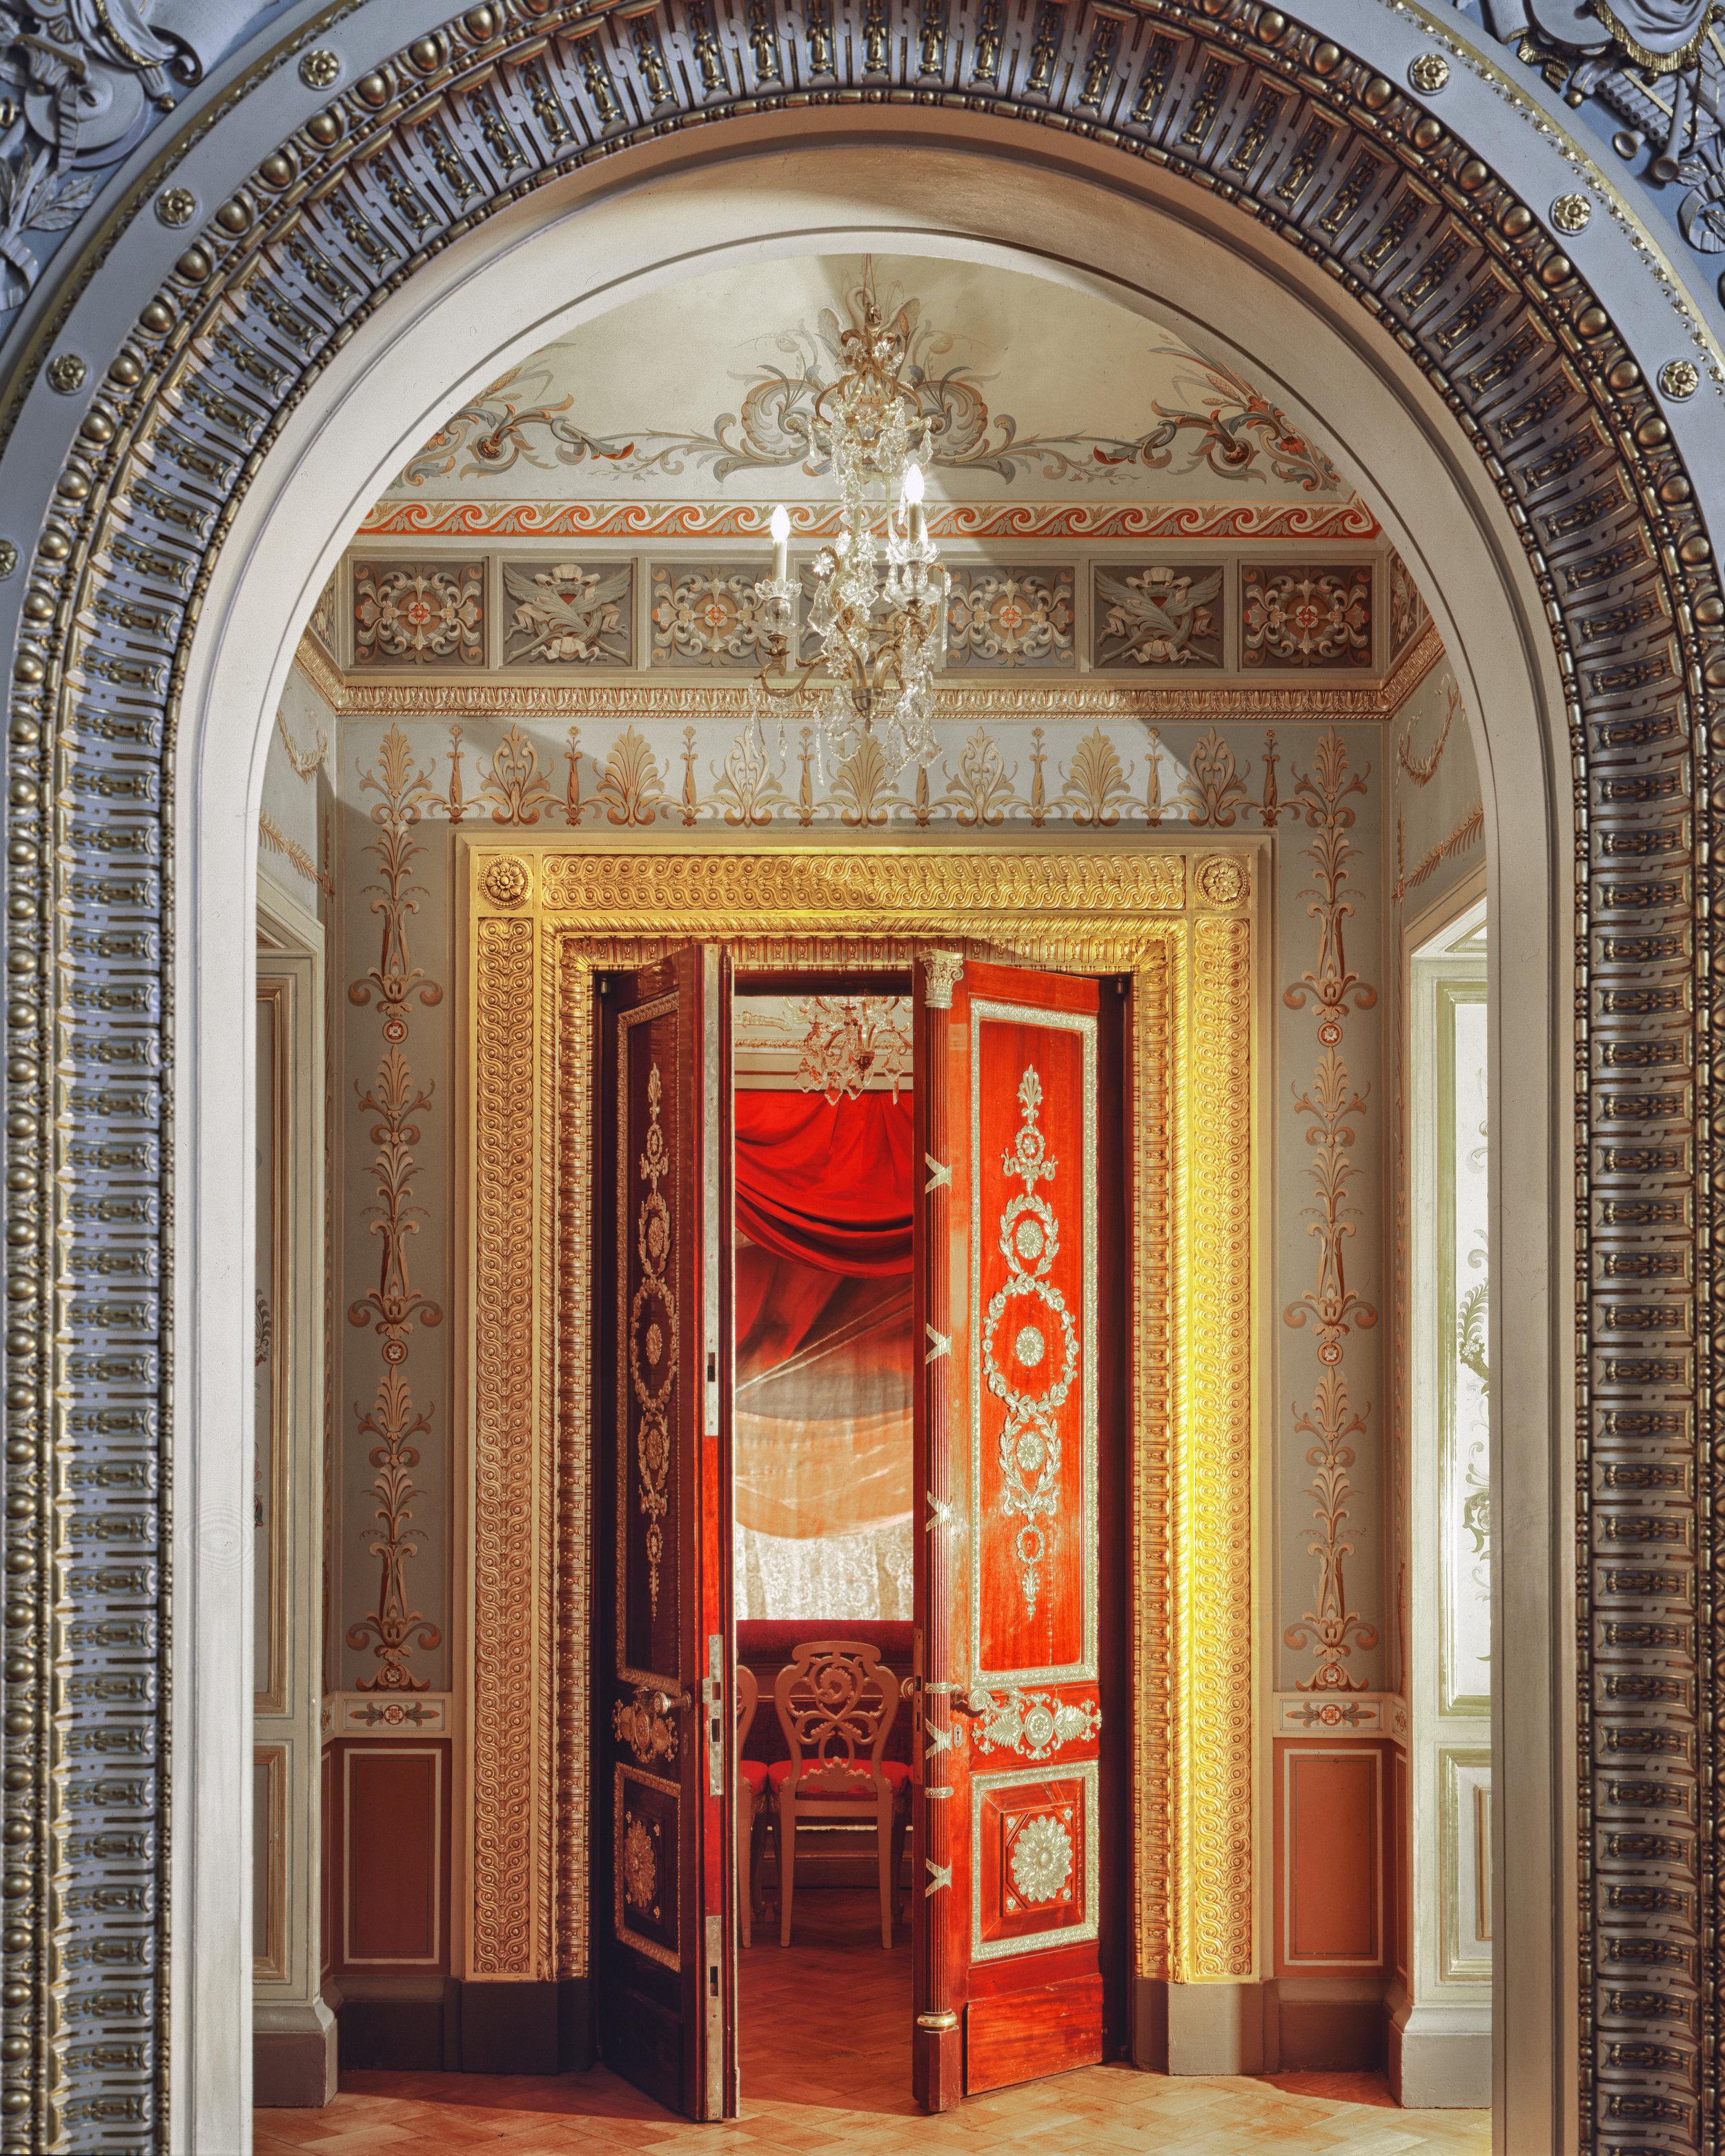 Musée de l'Hermitage - Saint Petersbourg 2008